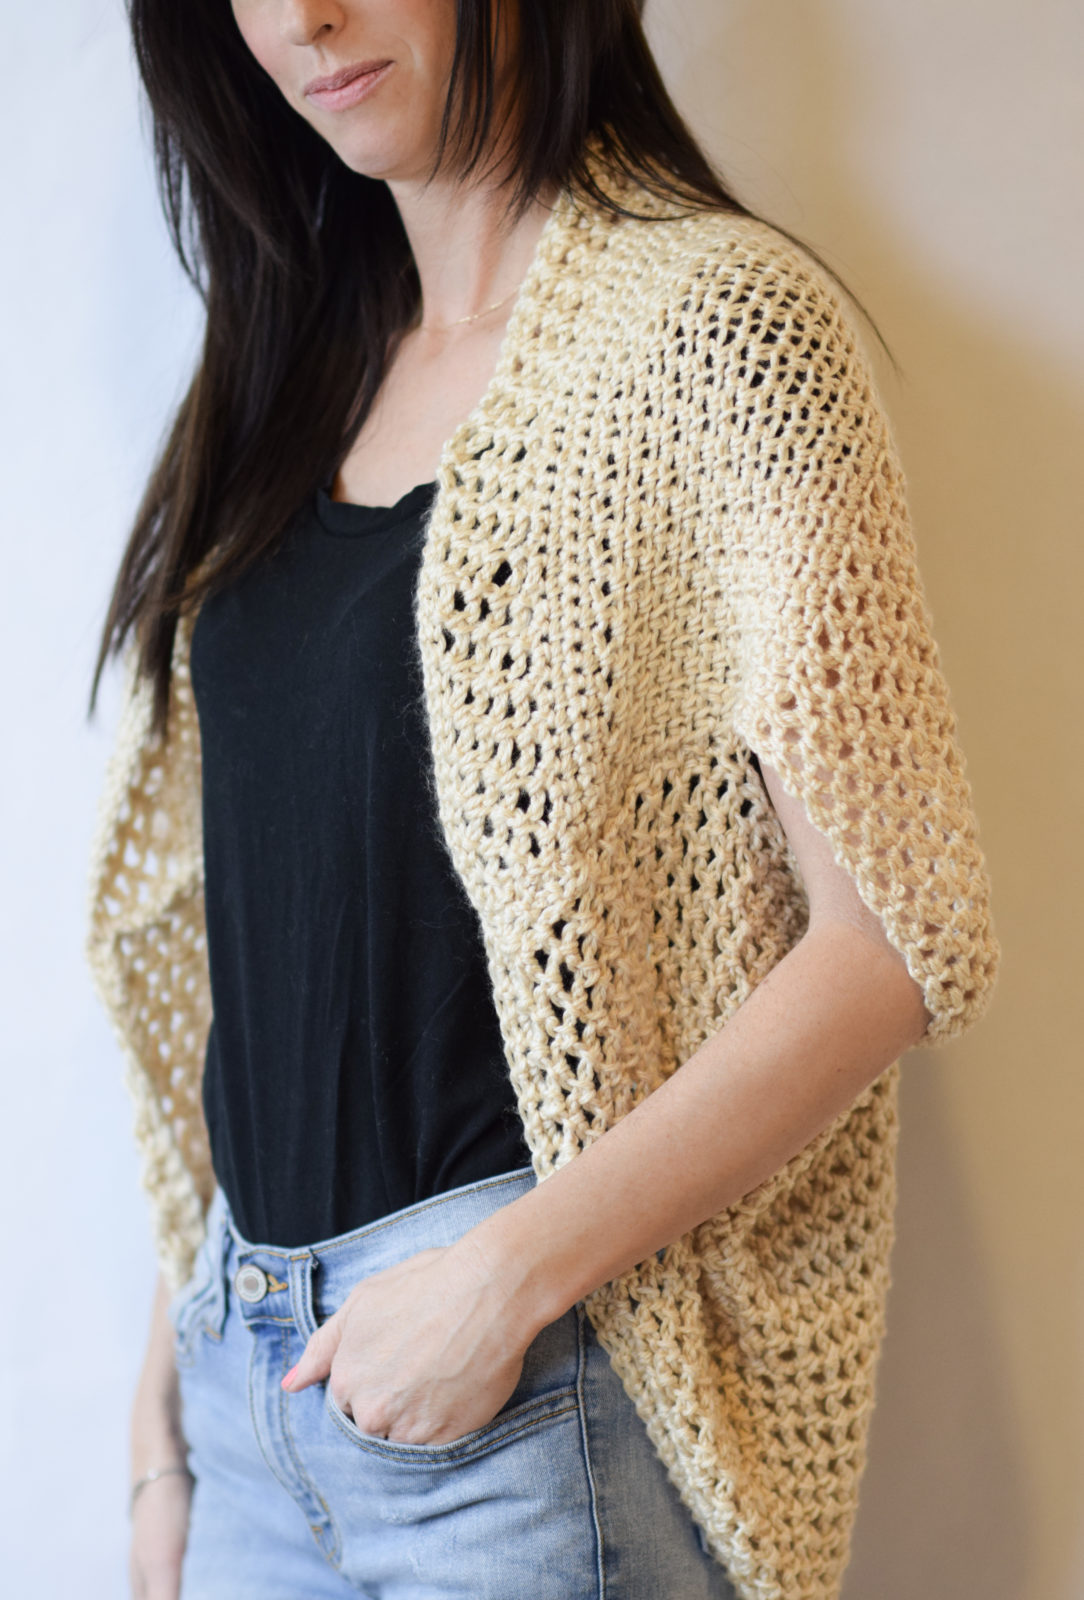 easy-crochet-sweater-pattern-shrug-mod-blanket-sweater 4875bf239